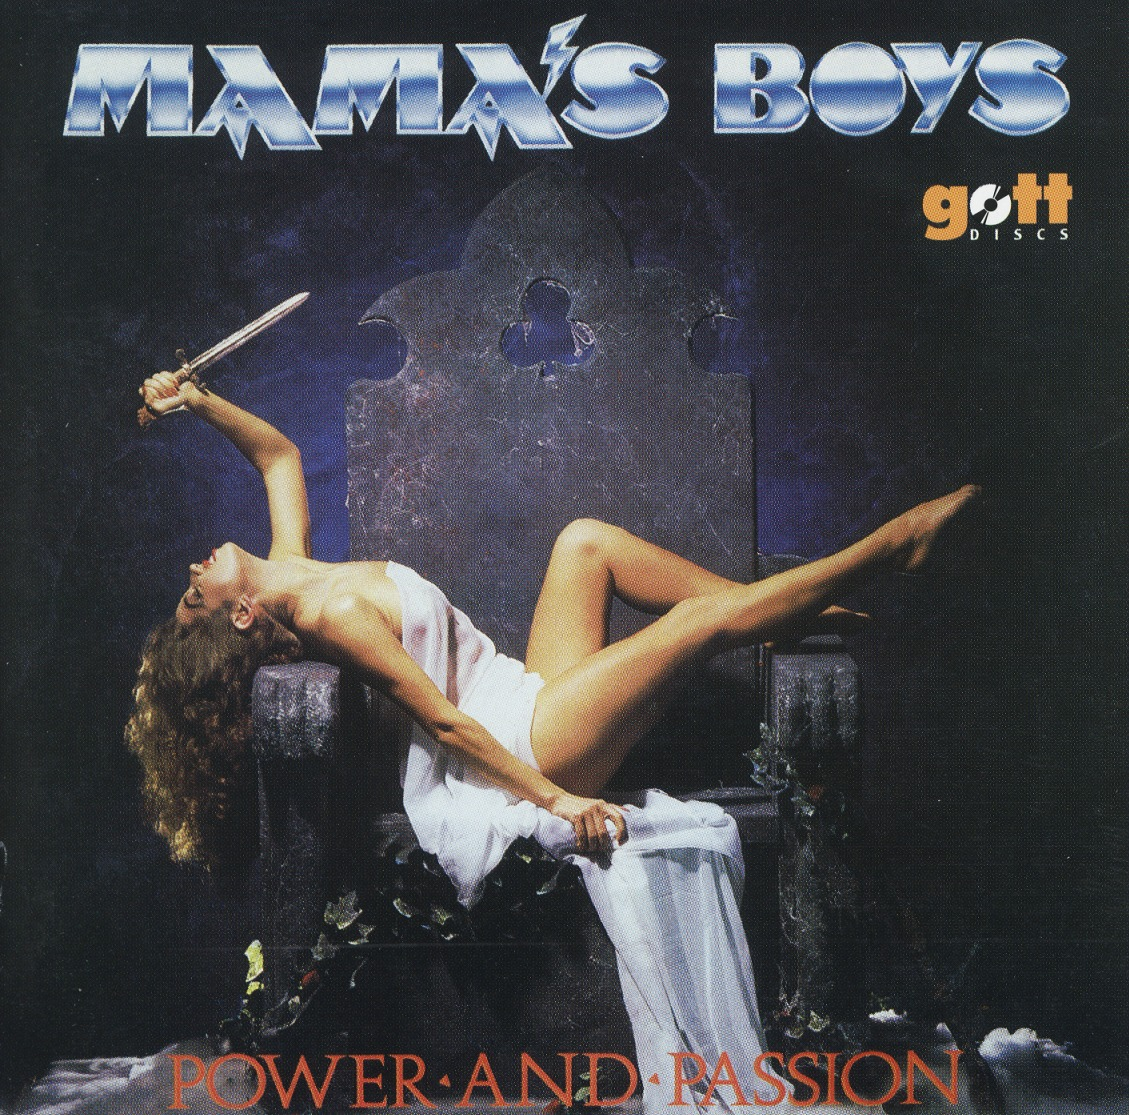 MAMA'S BOYS (Ireland) / Power And Passion